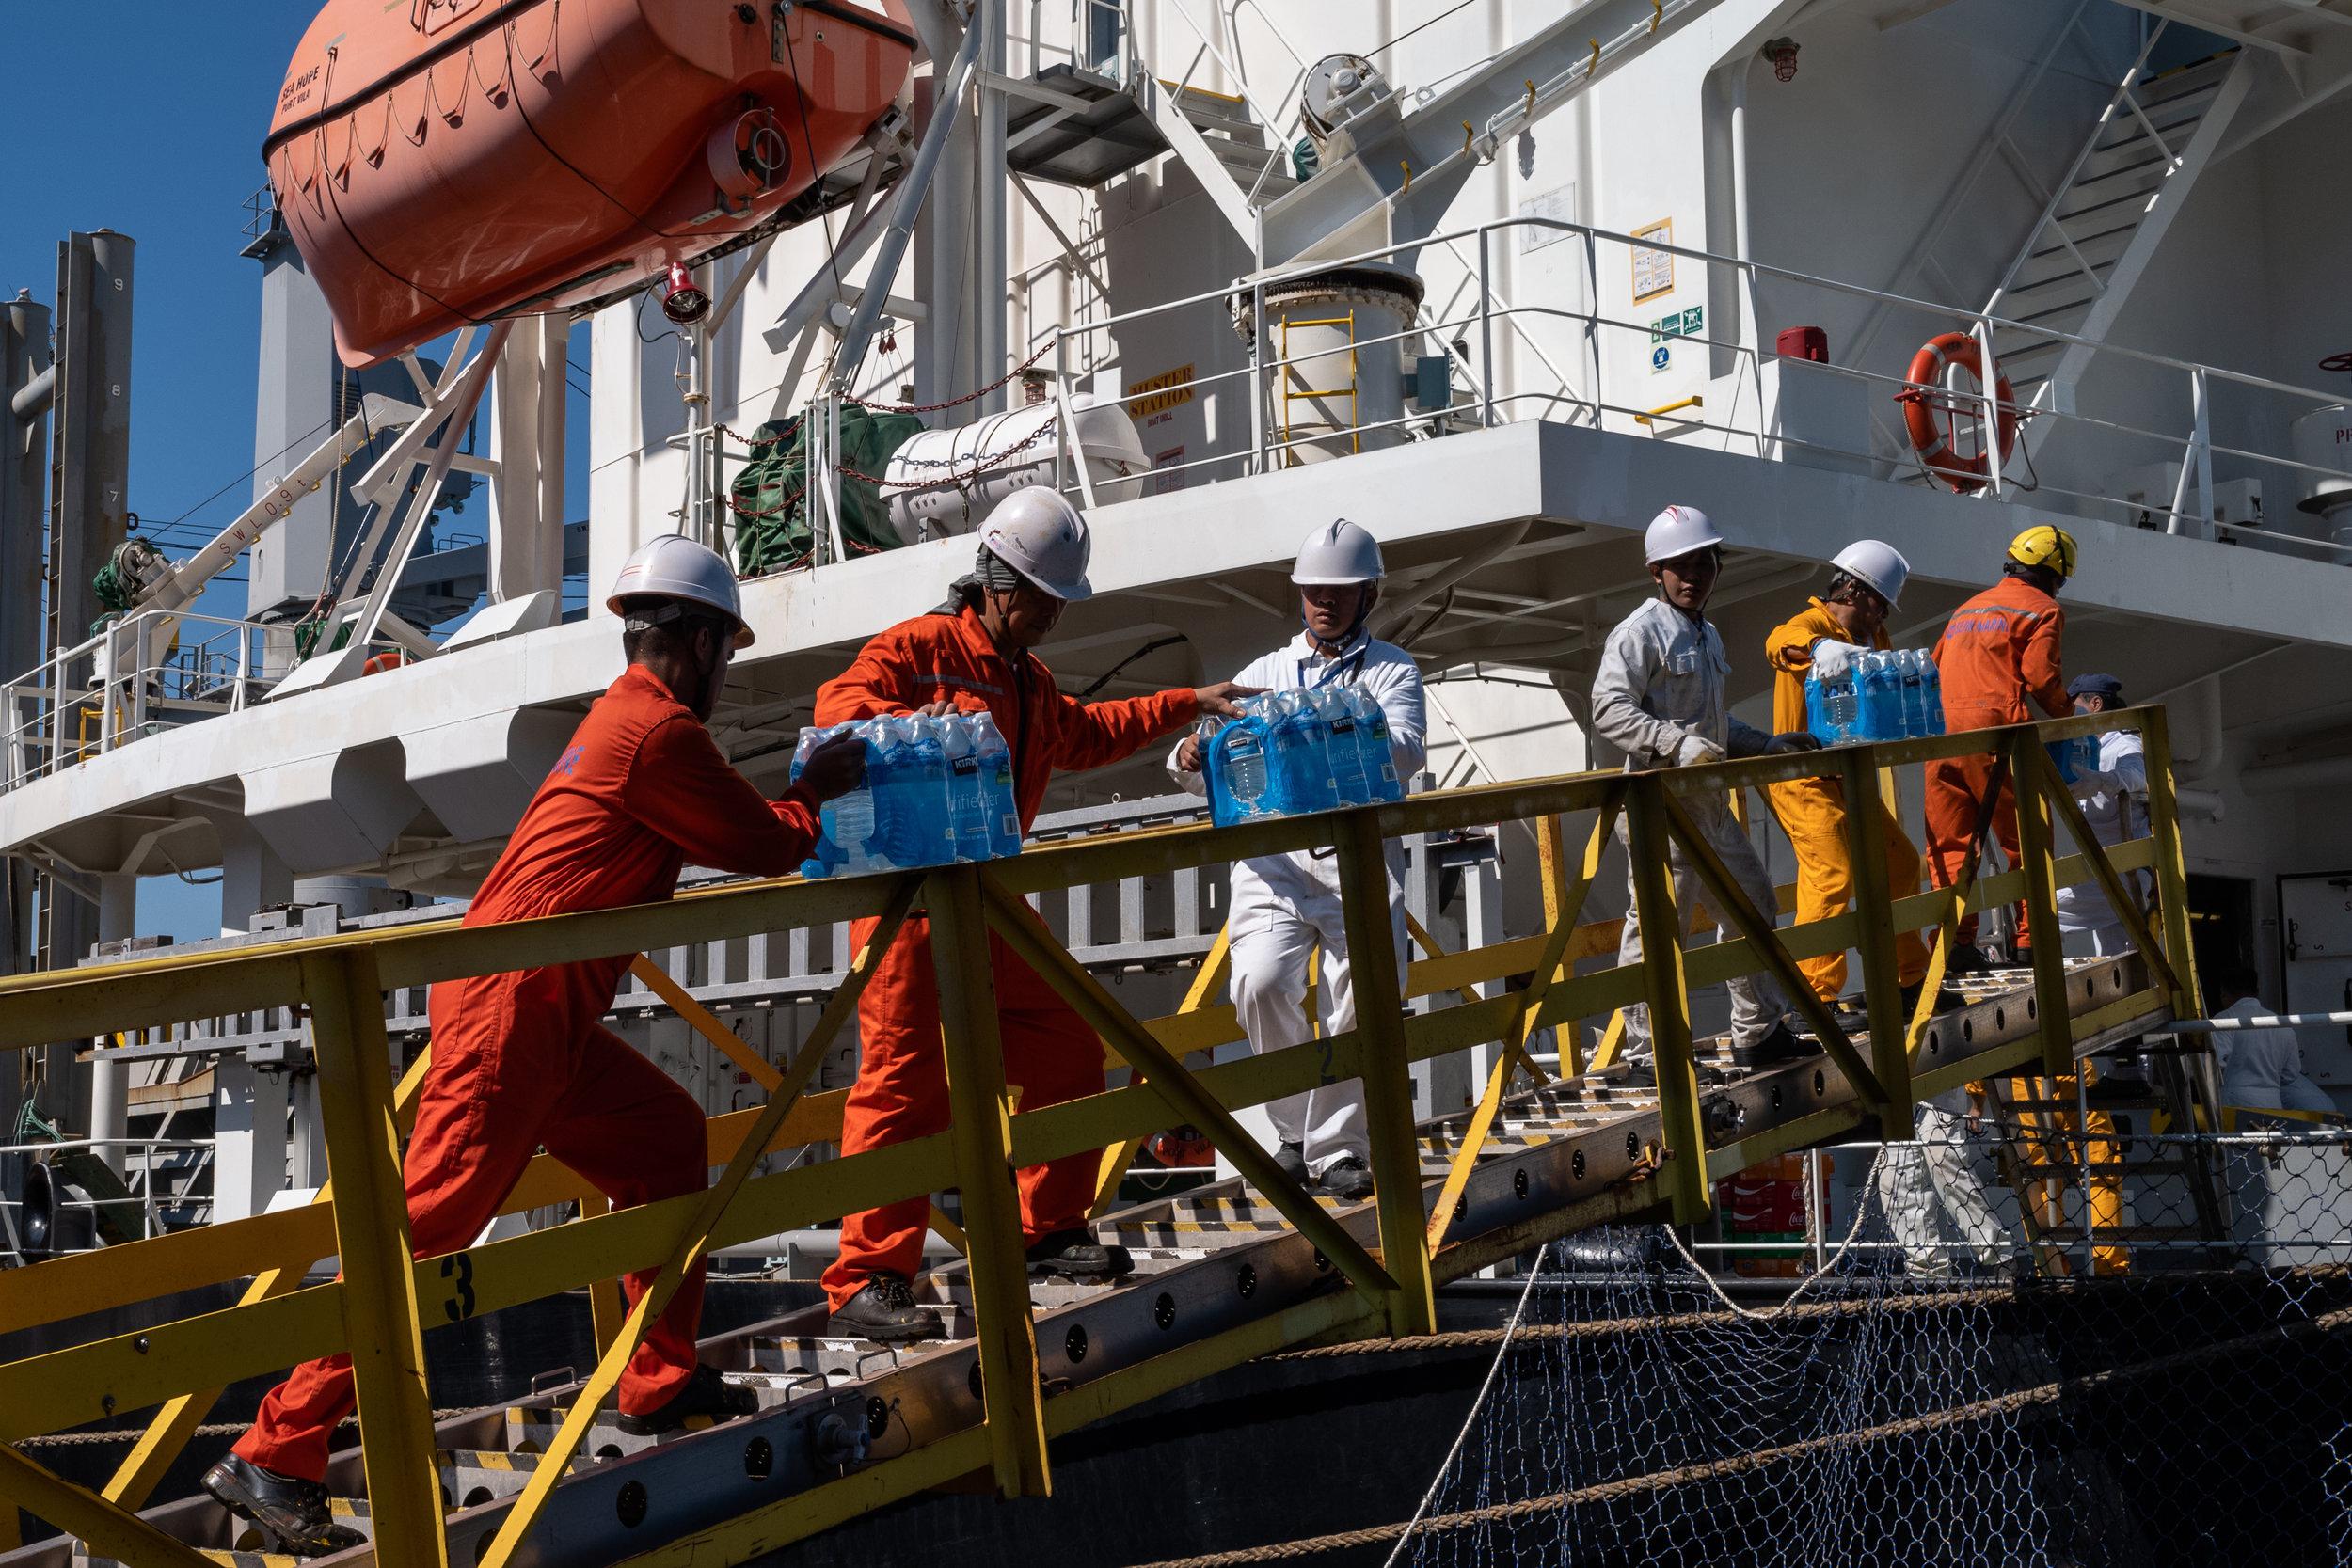 Filipino Seafarers - Photo essay by: Justin Katigbak